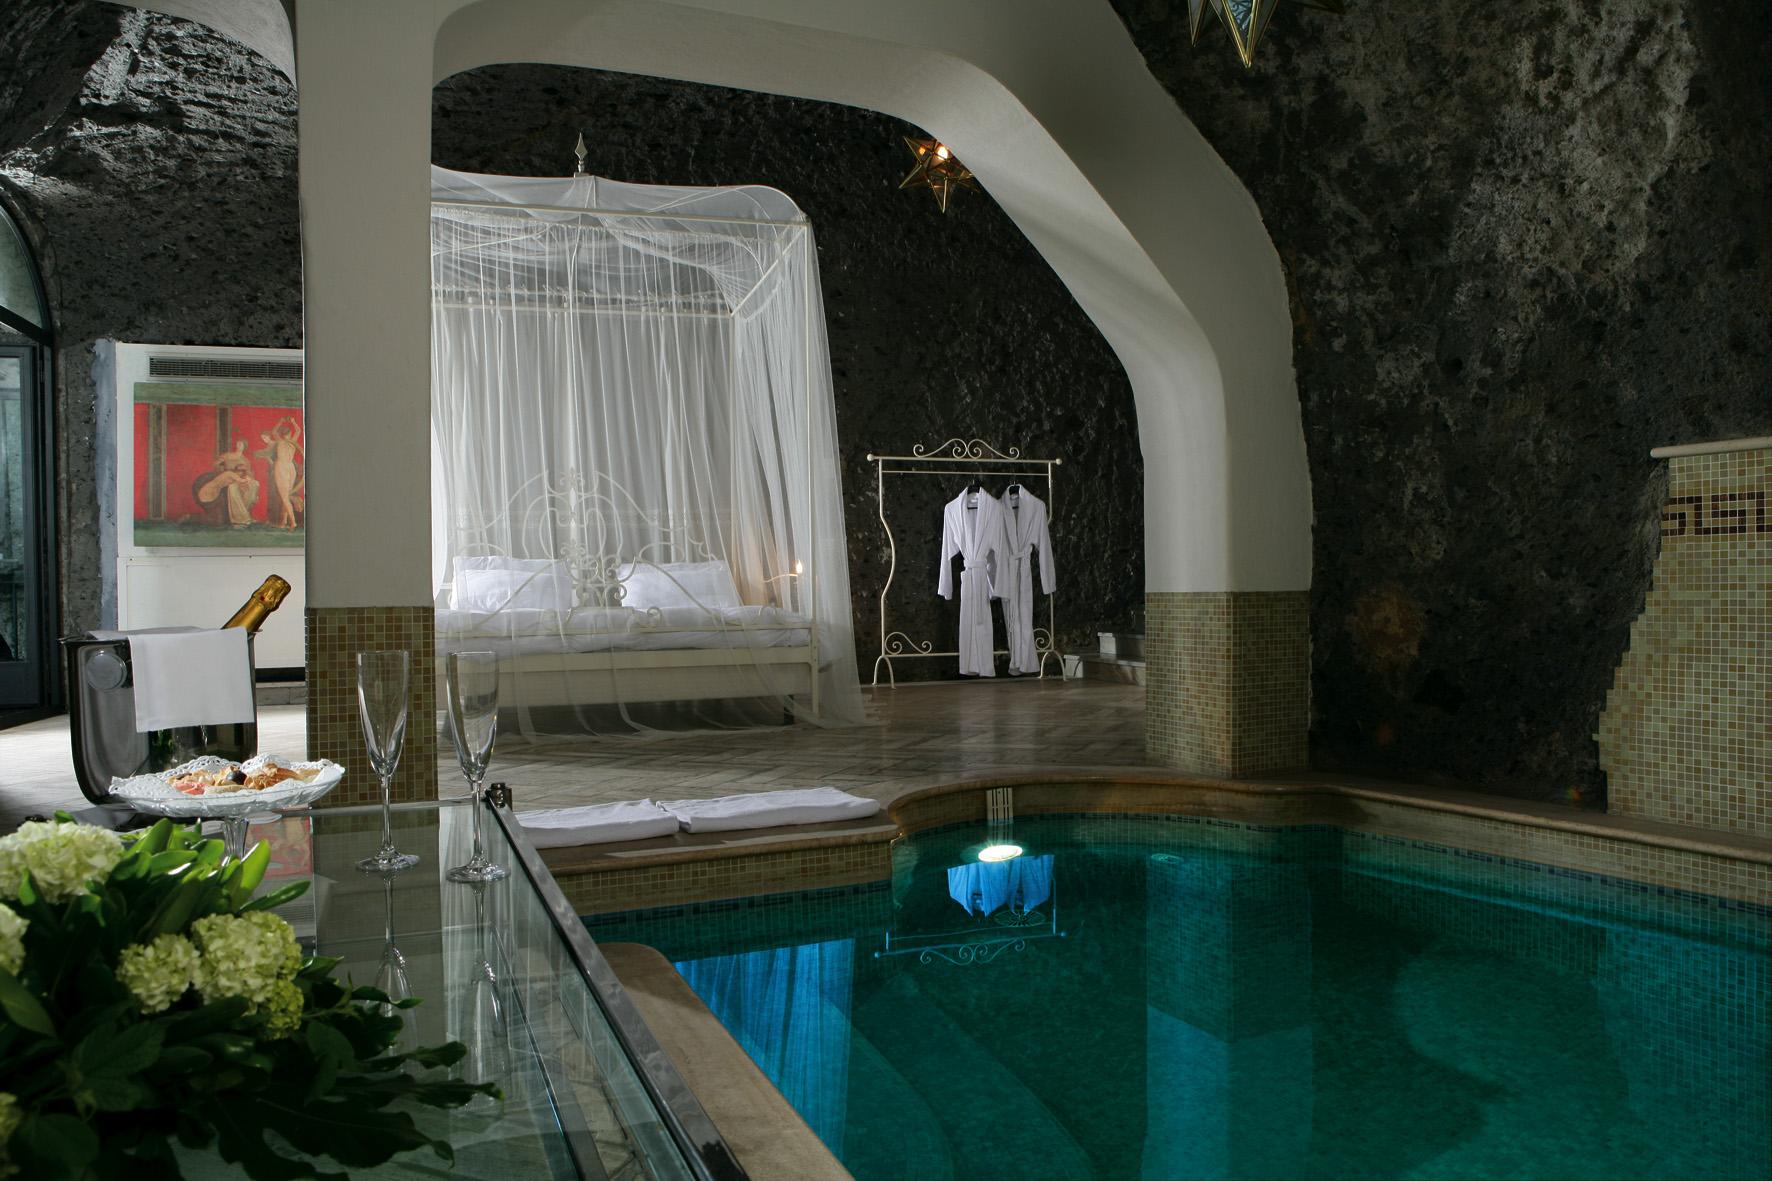 Hotel Bellevue Syrene in Sorrento  TravelAmalficom